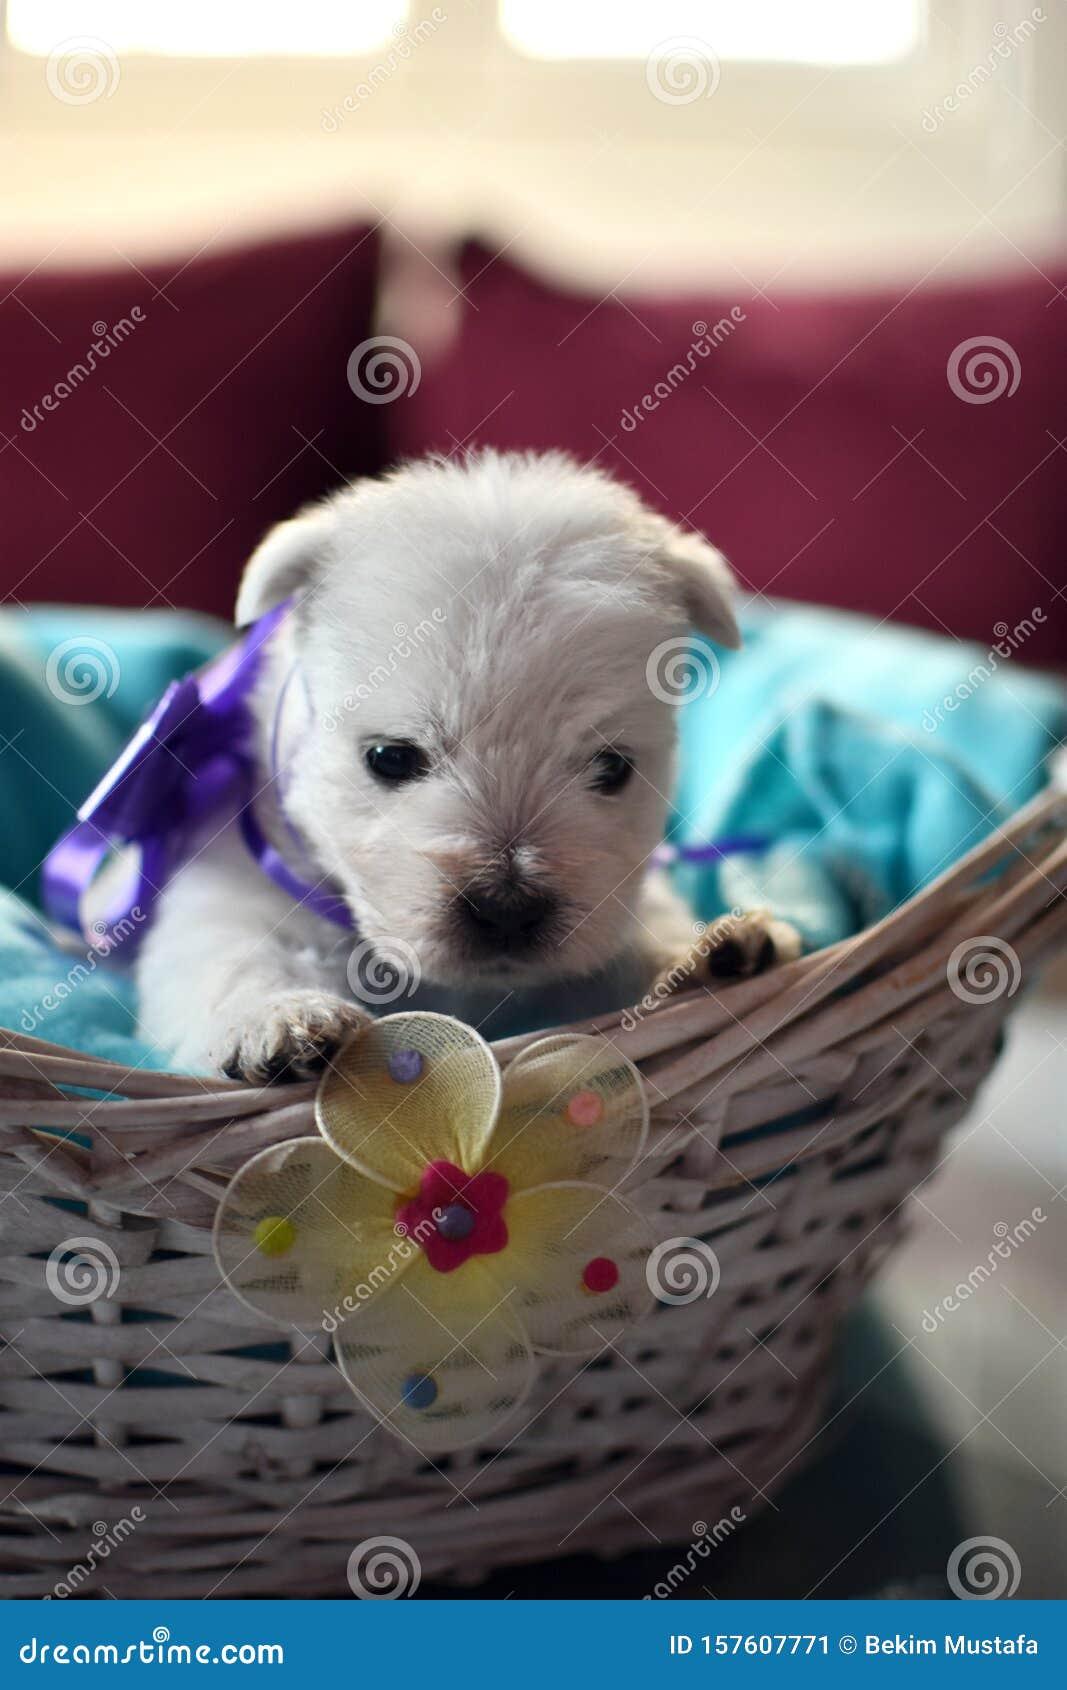 West Highland White Terrier Westie Puppies Stock Image Image Of Westie West 157607771